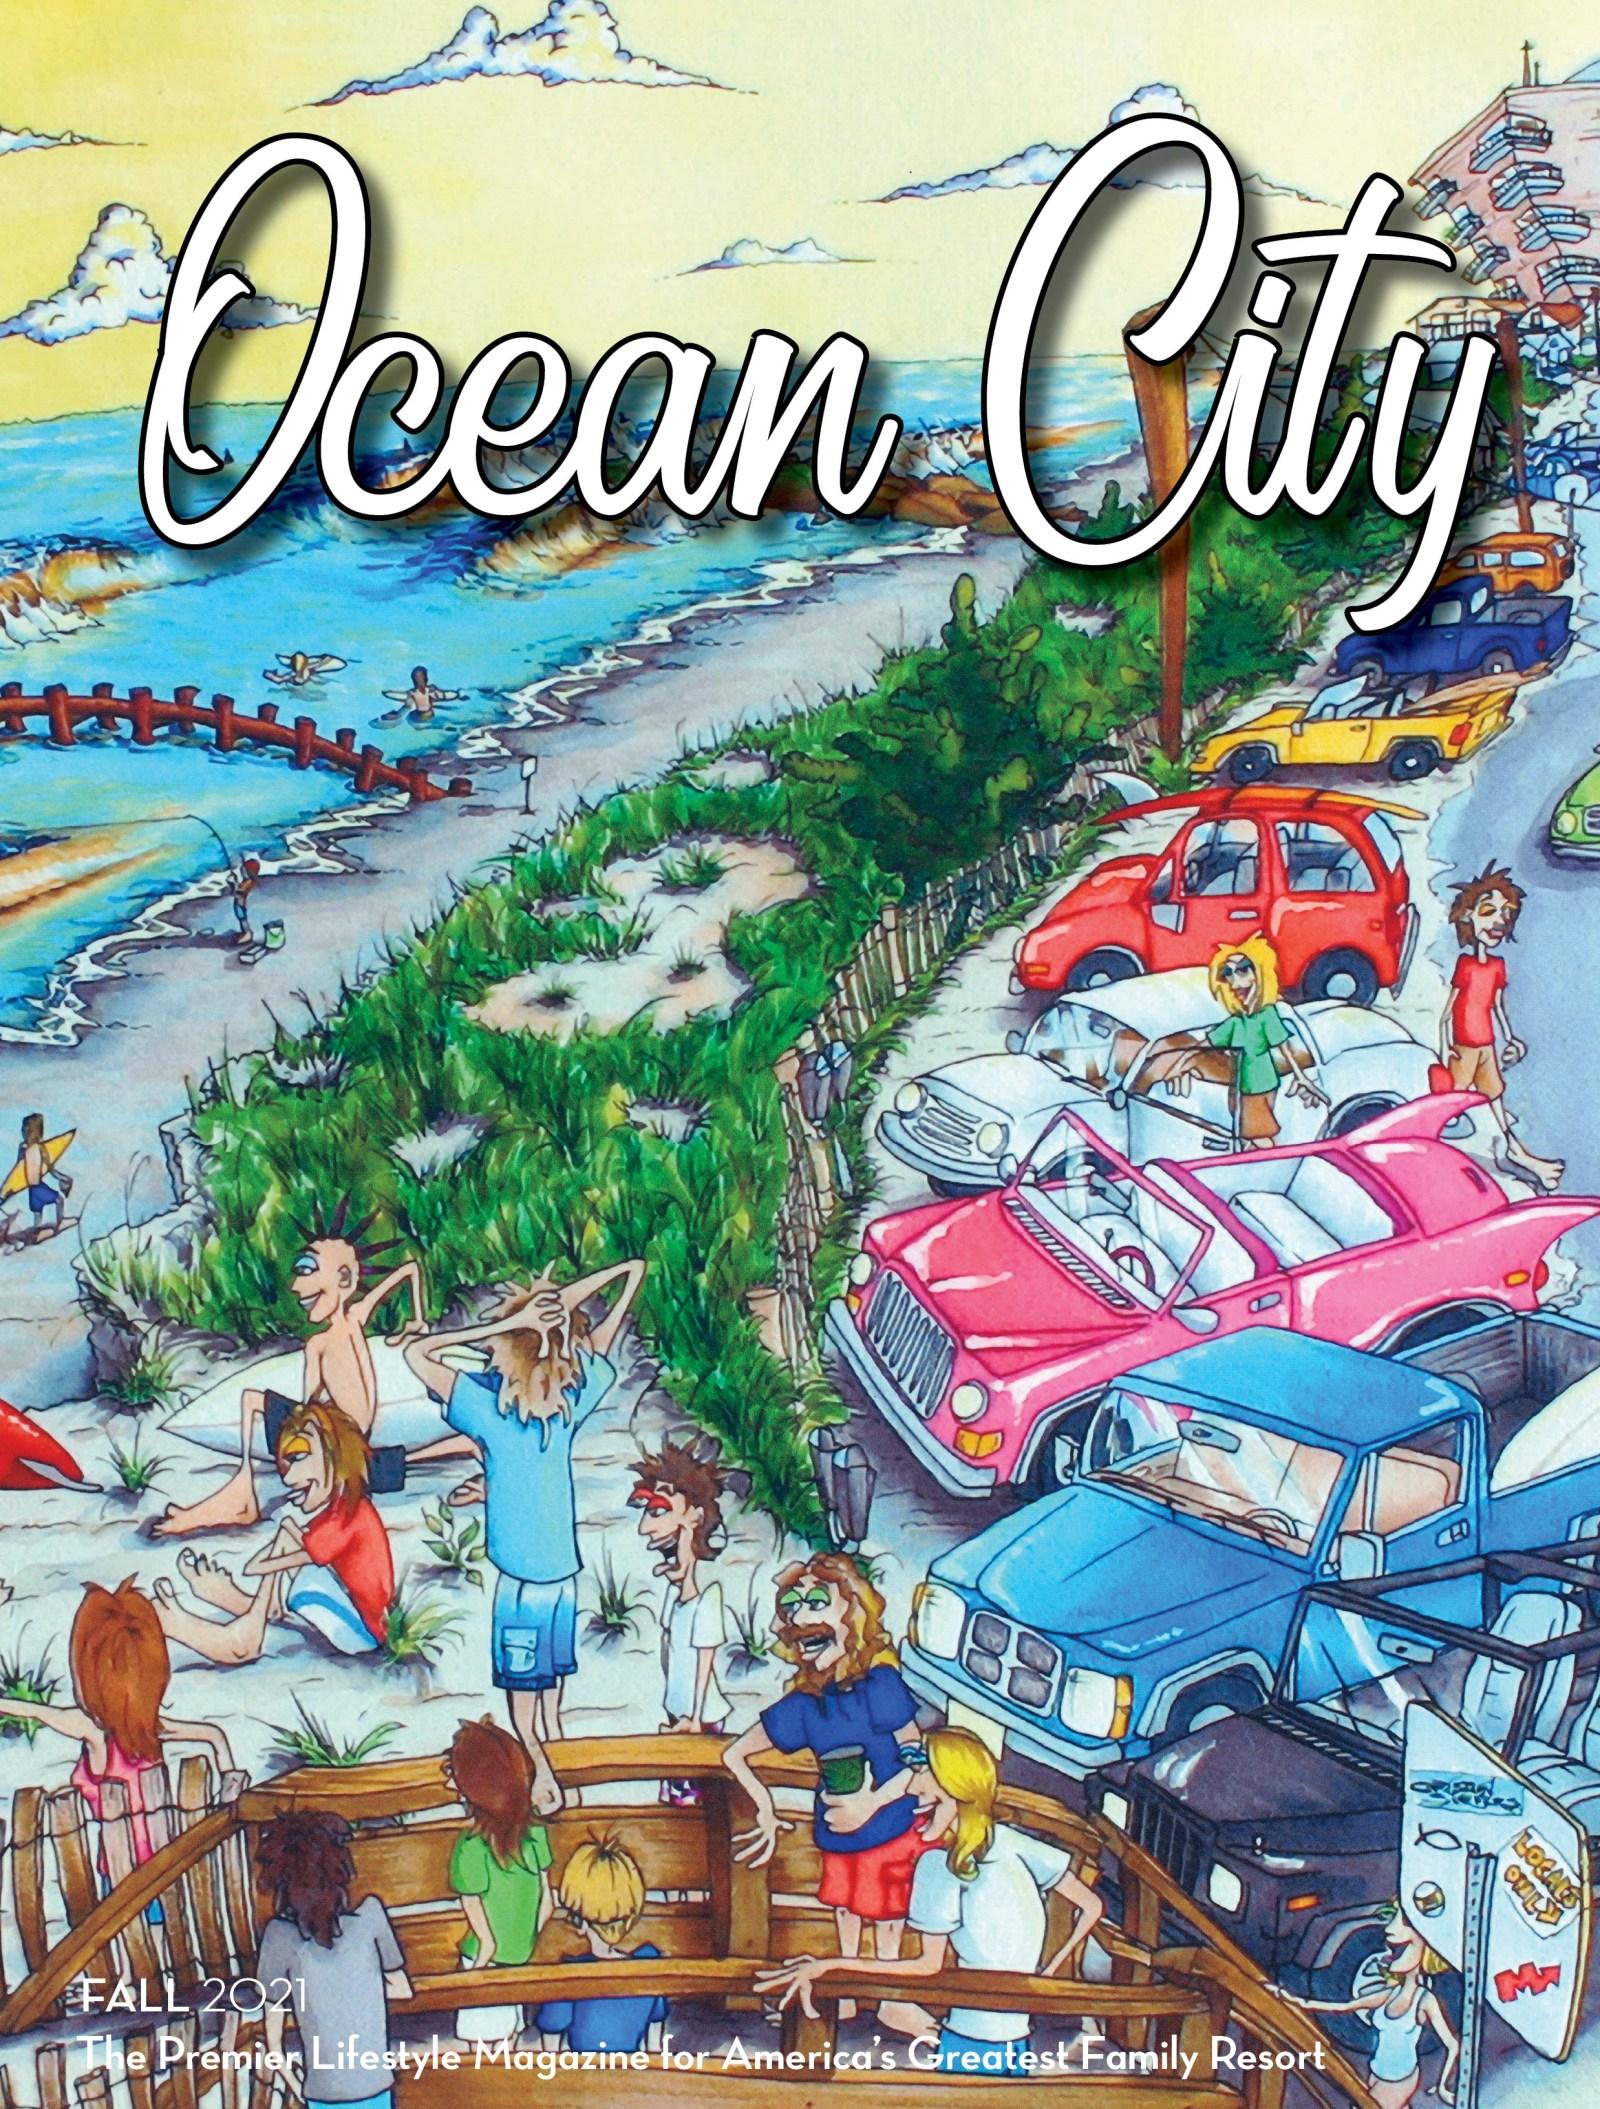 September/October 2021 Ocean City Magazine